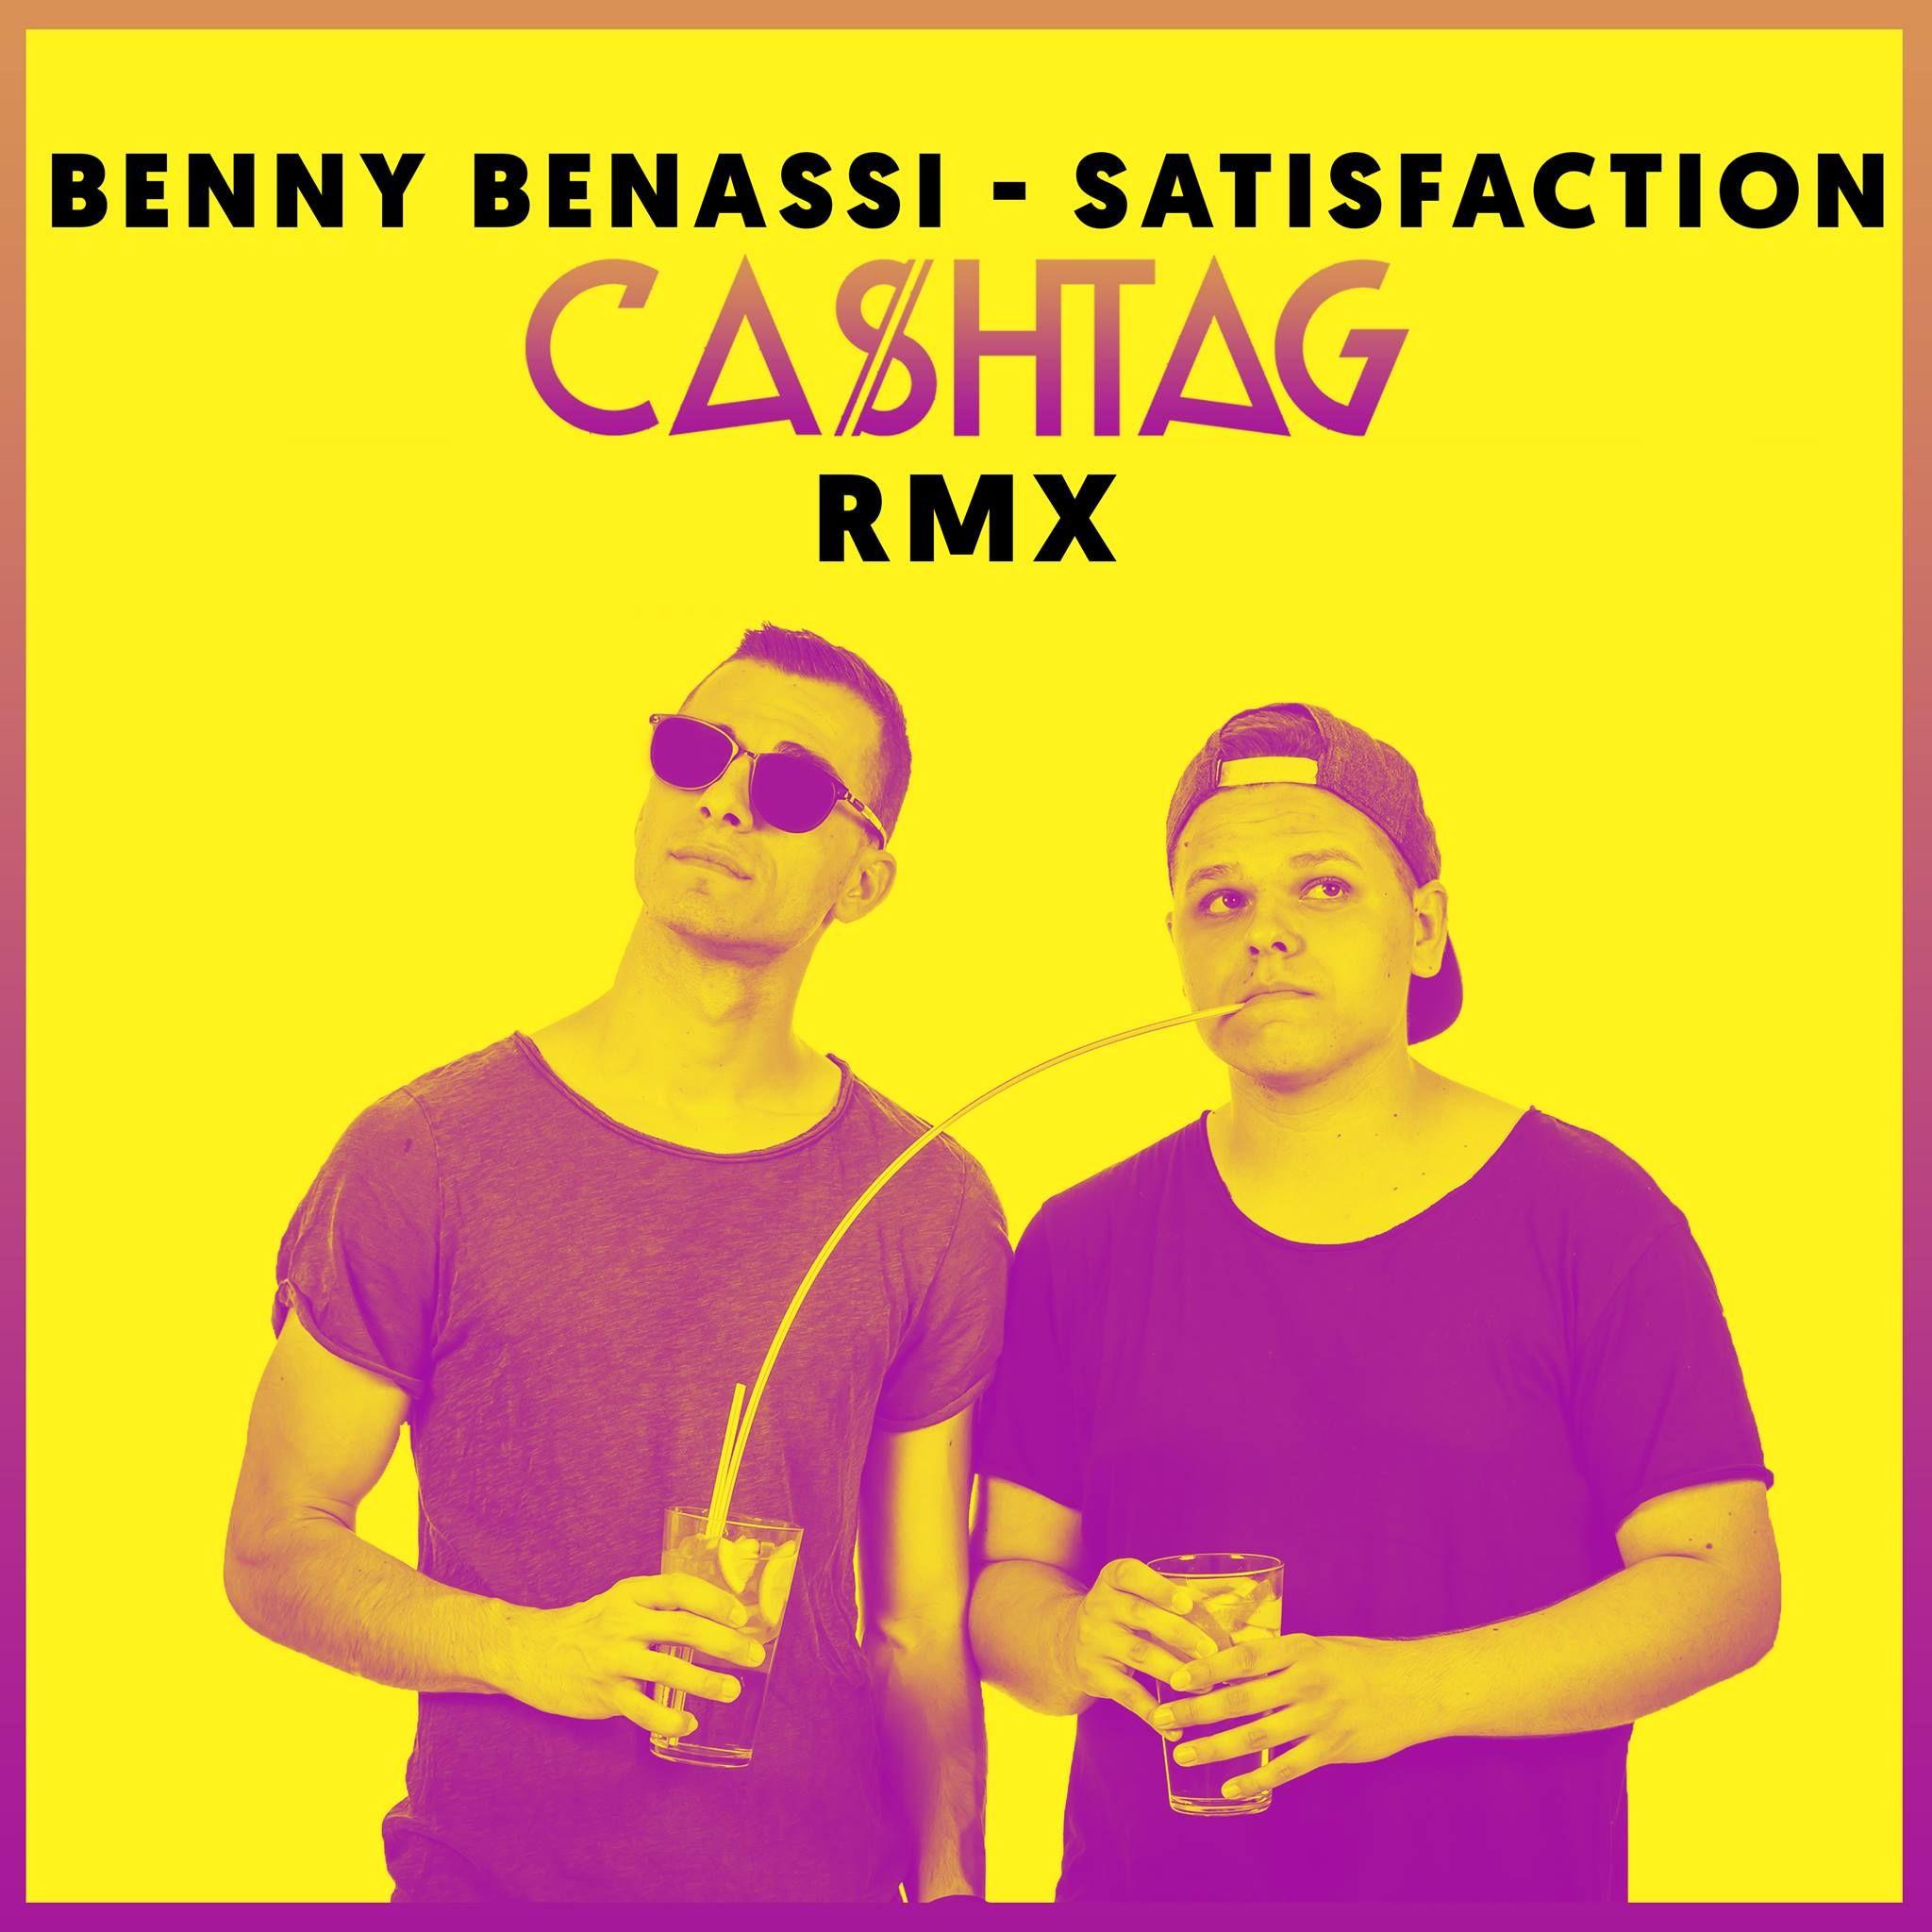 Benny Benassi Satisfaction Ca Htag Remix FR DOWNLOAD By Ca